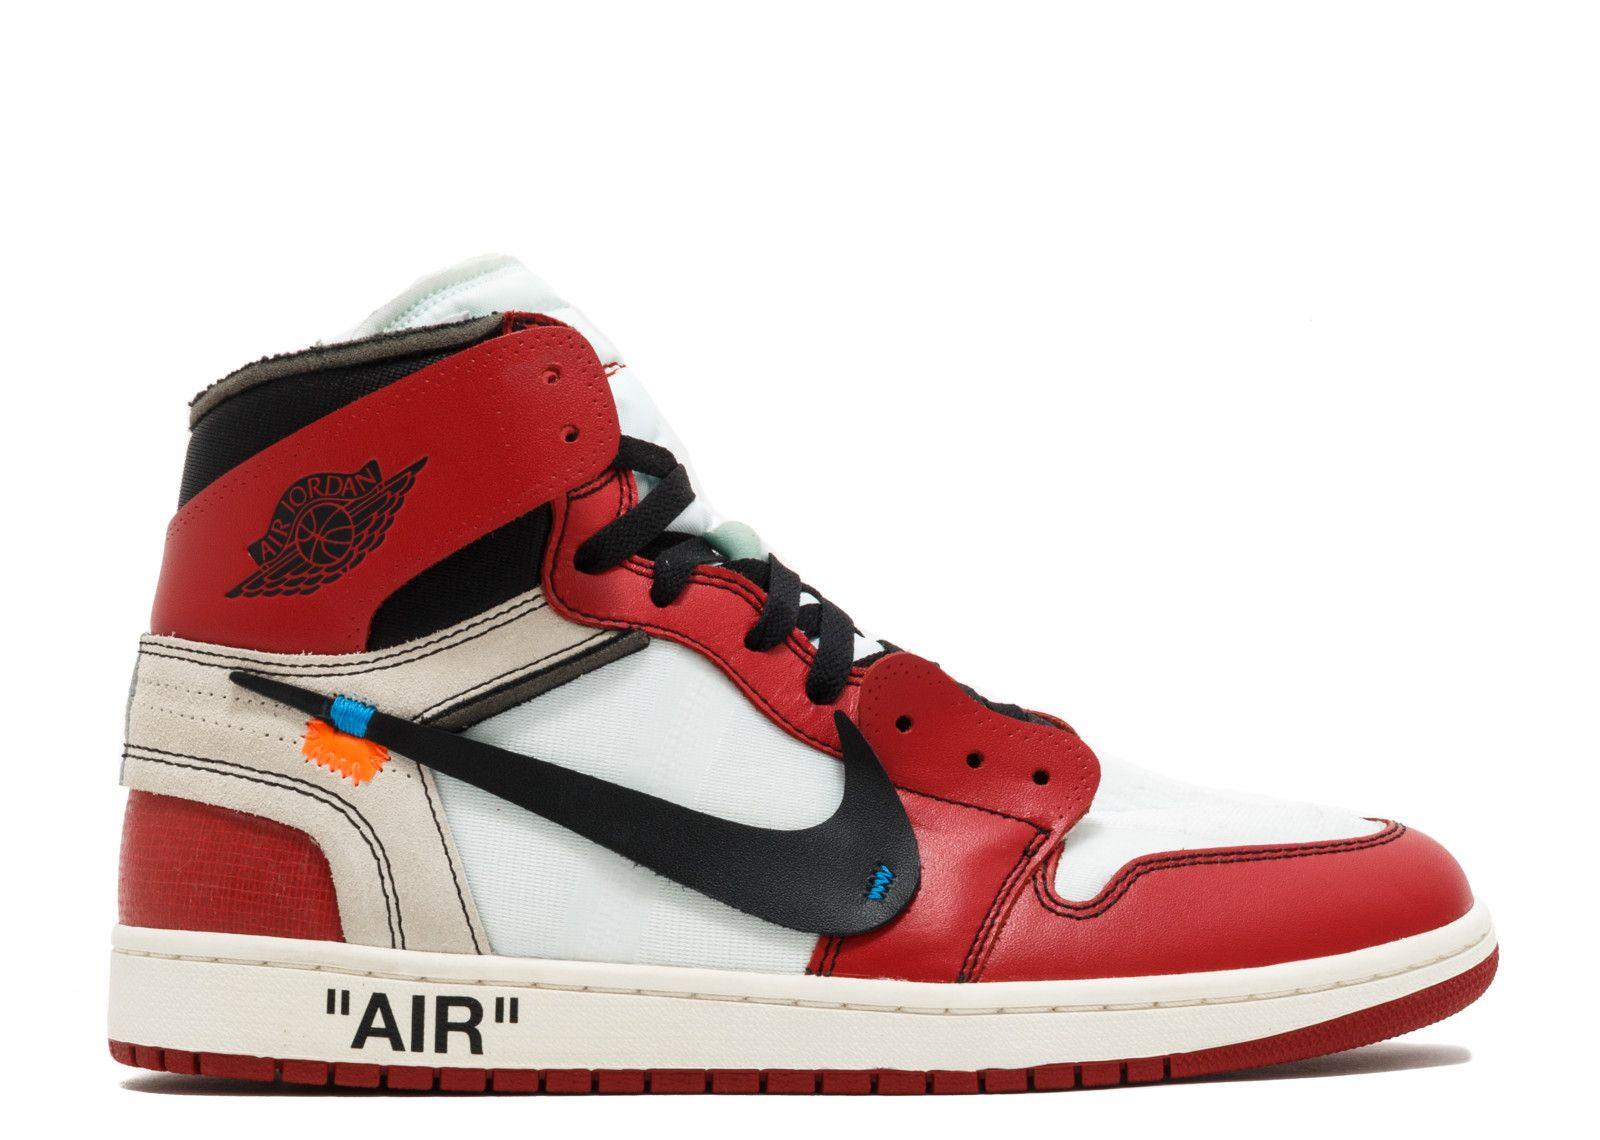 The 10 Air Jordan 1 Off White